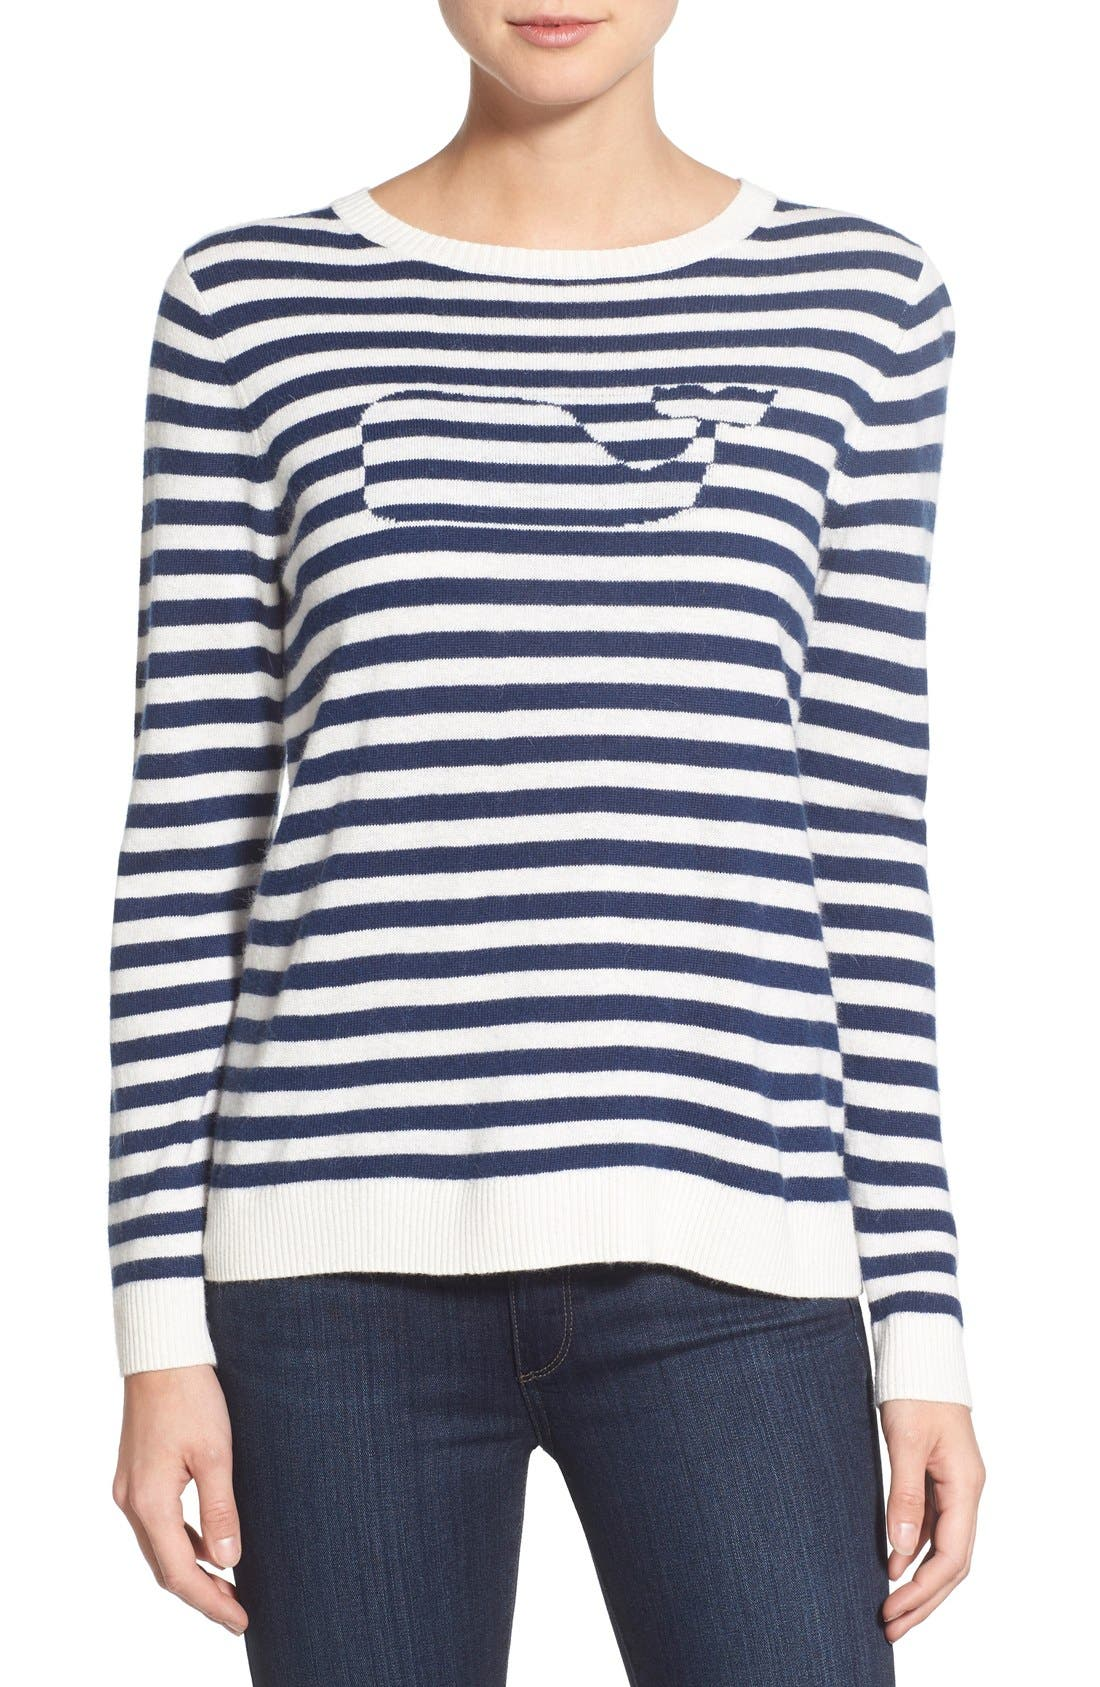 Main Image - Vineyard Vines 'Nautical Stripe Whale' Crewneck Sweater